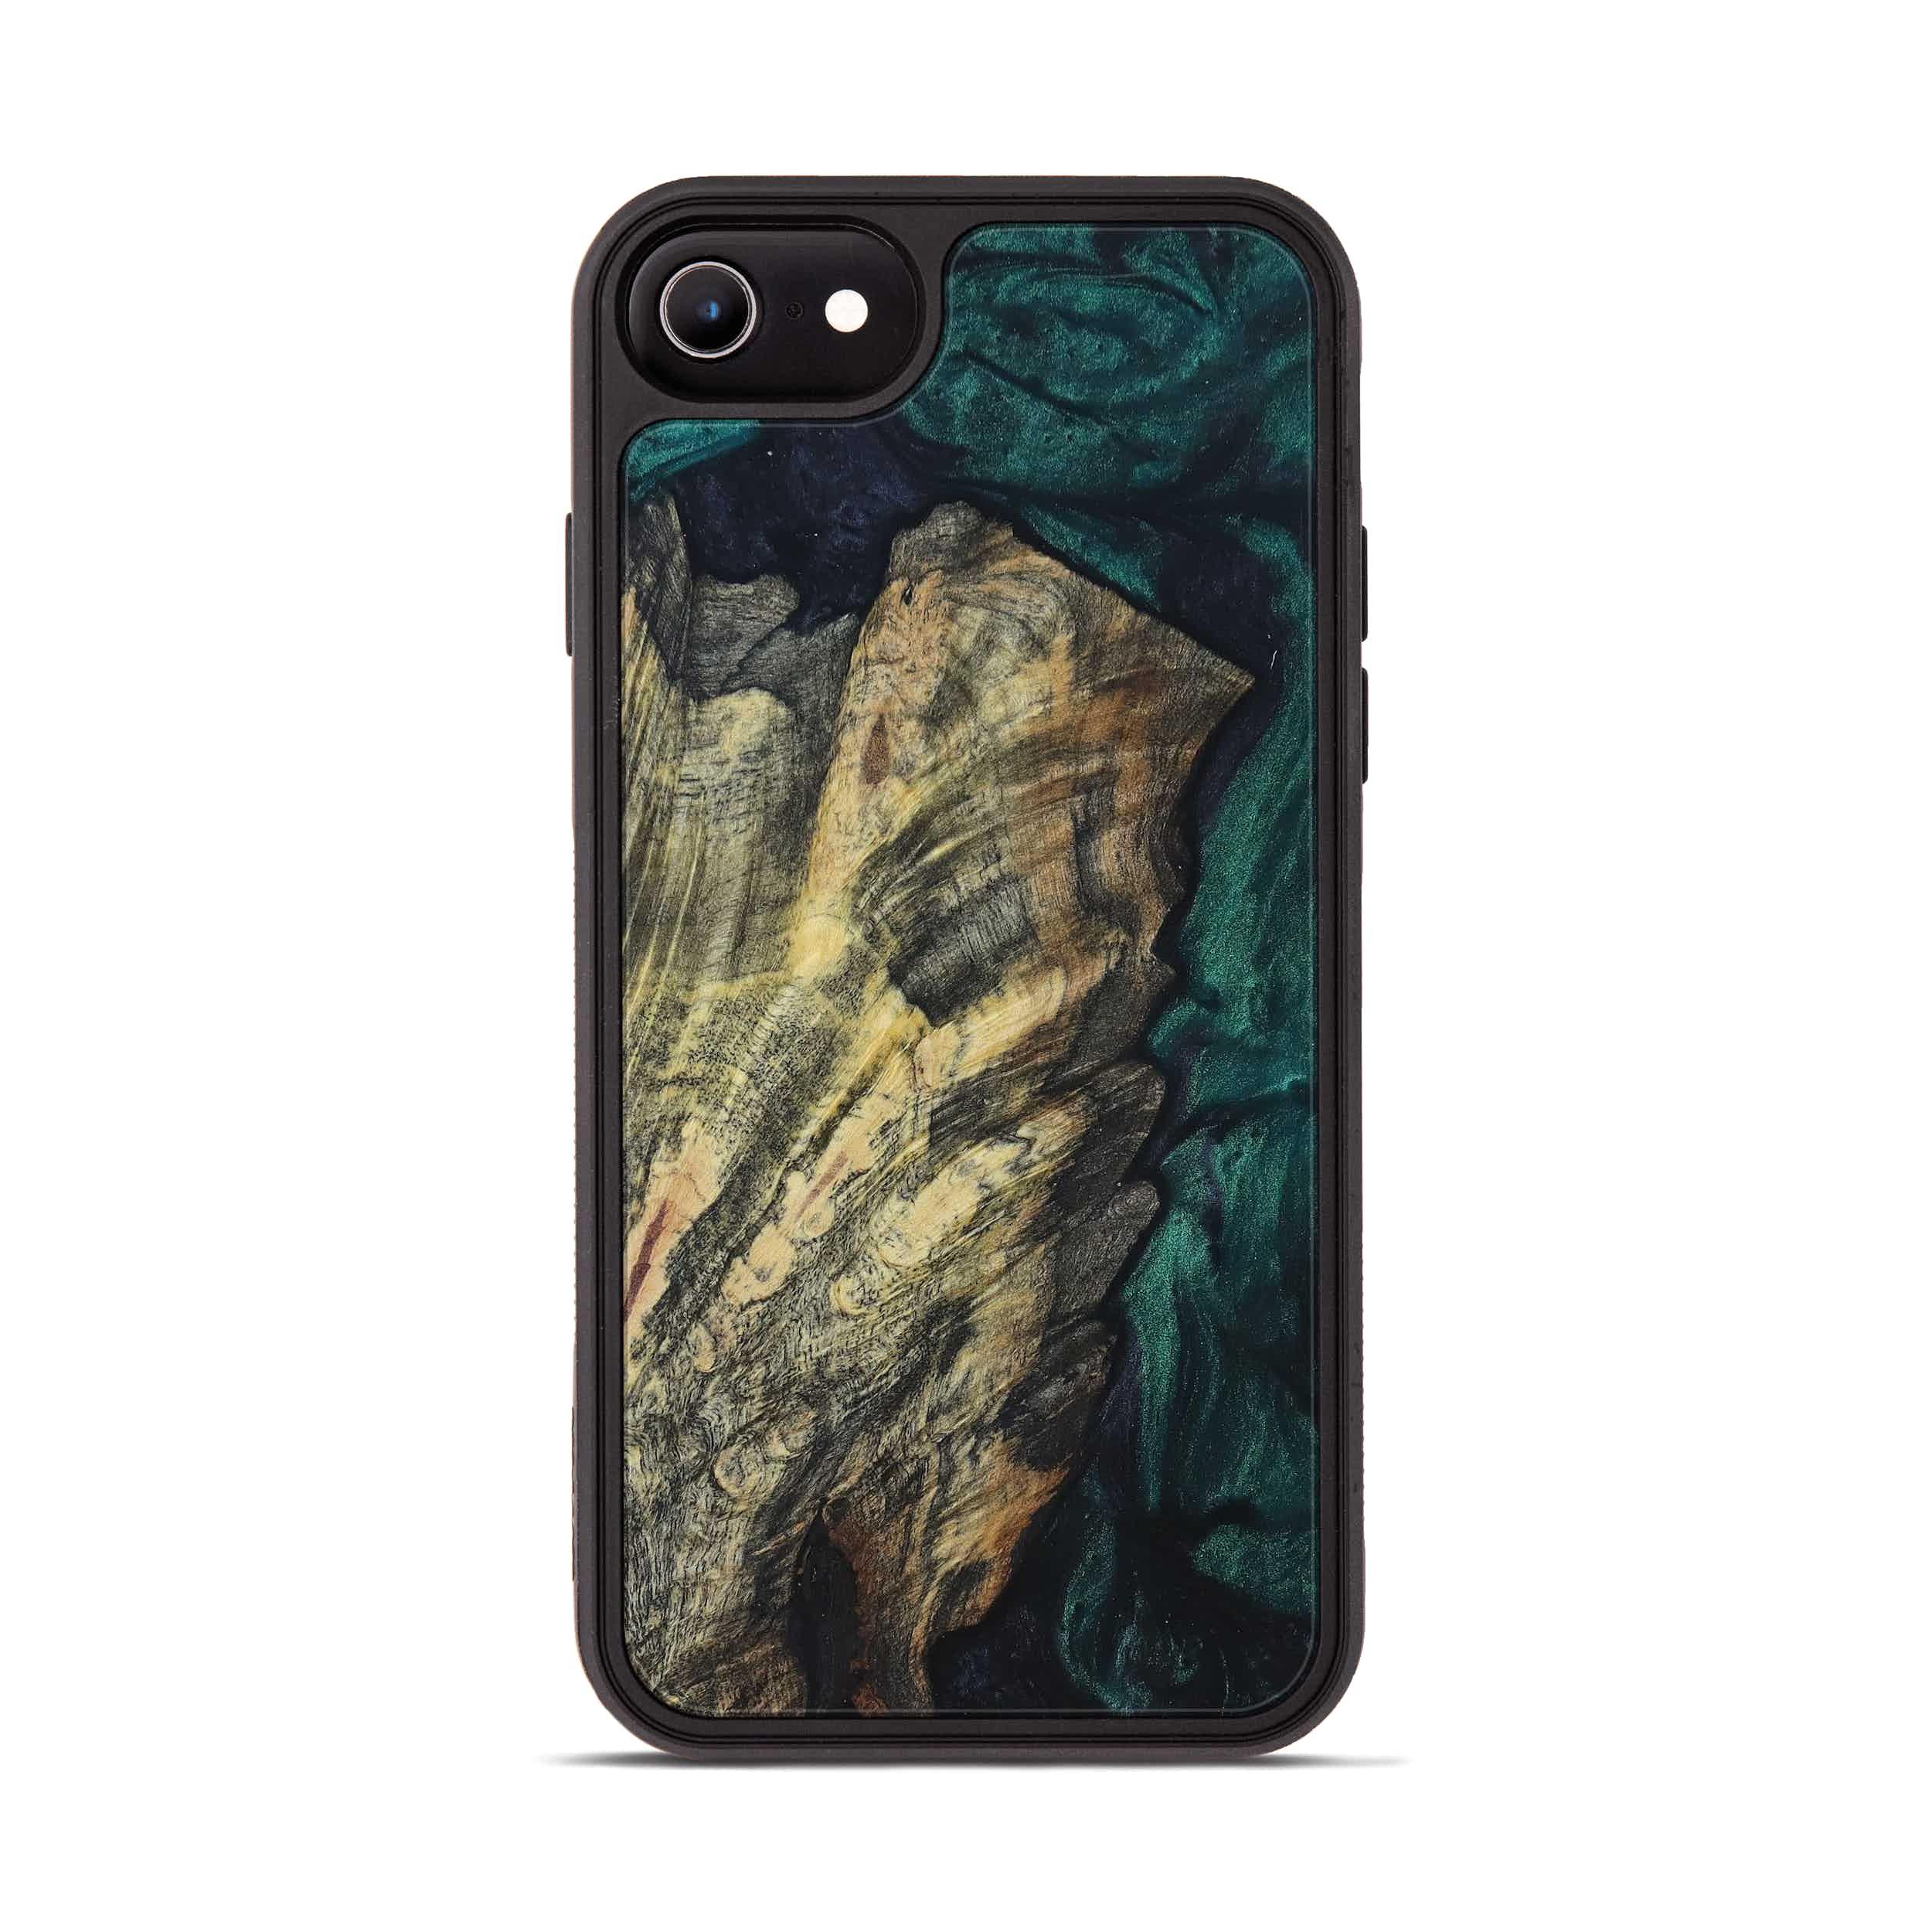 iPhone 8 Wood+Resin Phone Case - Vally (Dark Green, 394853)